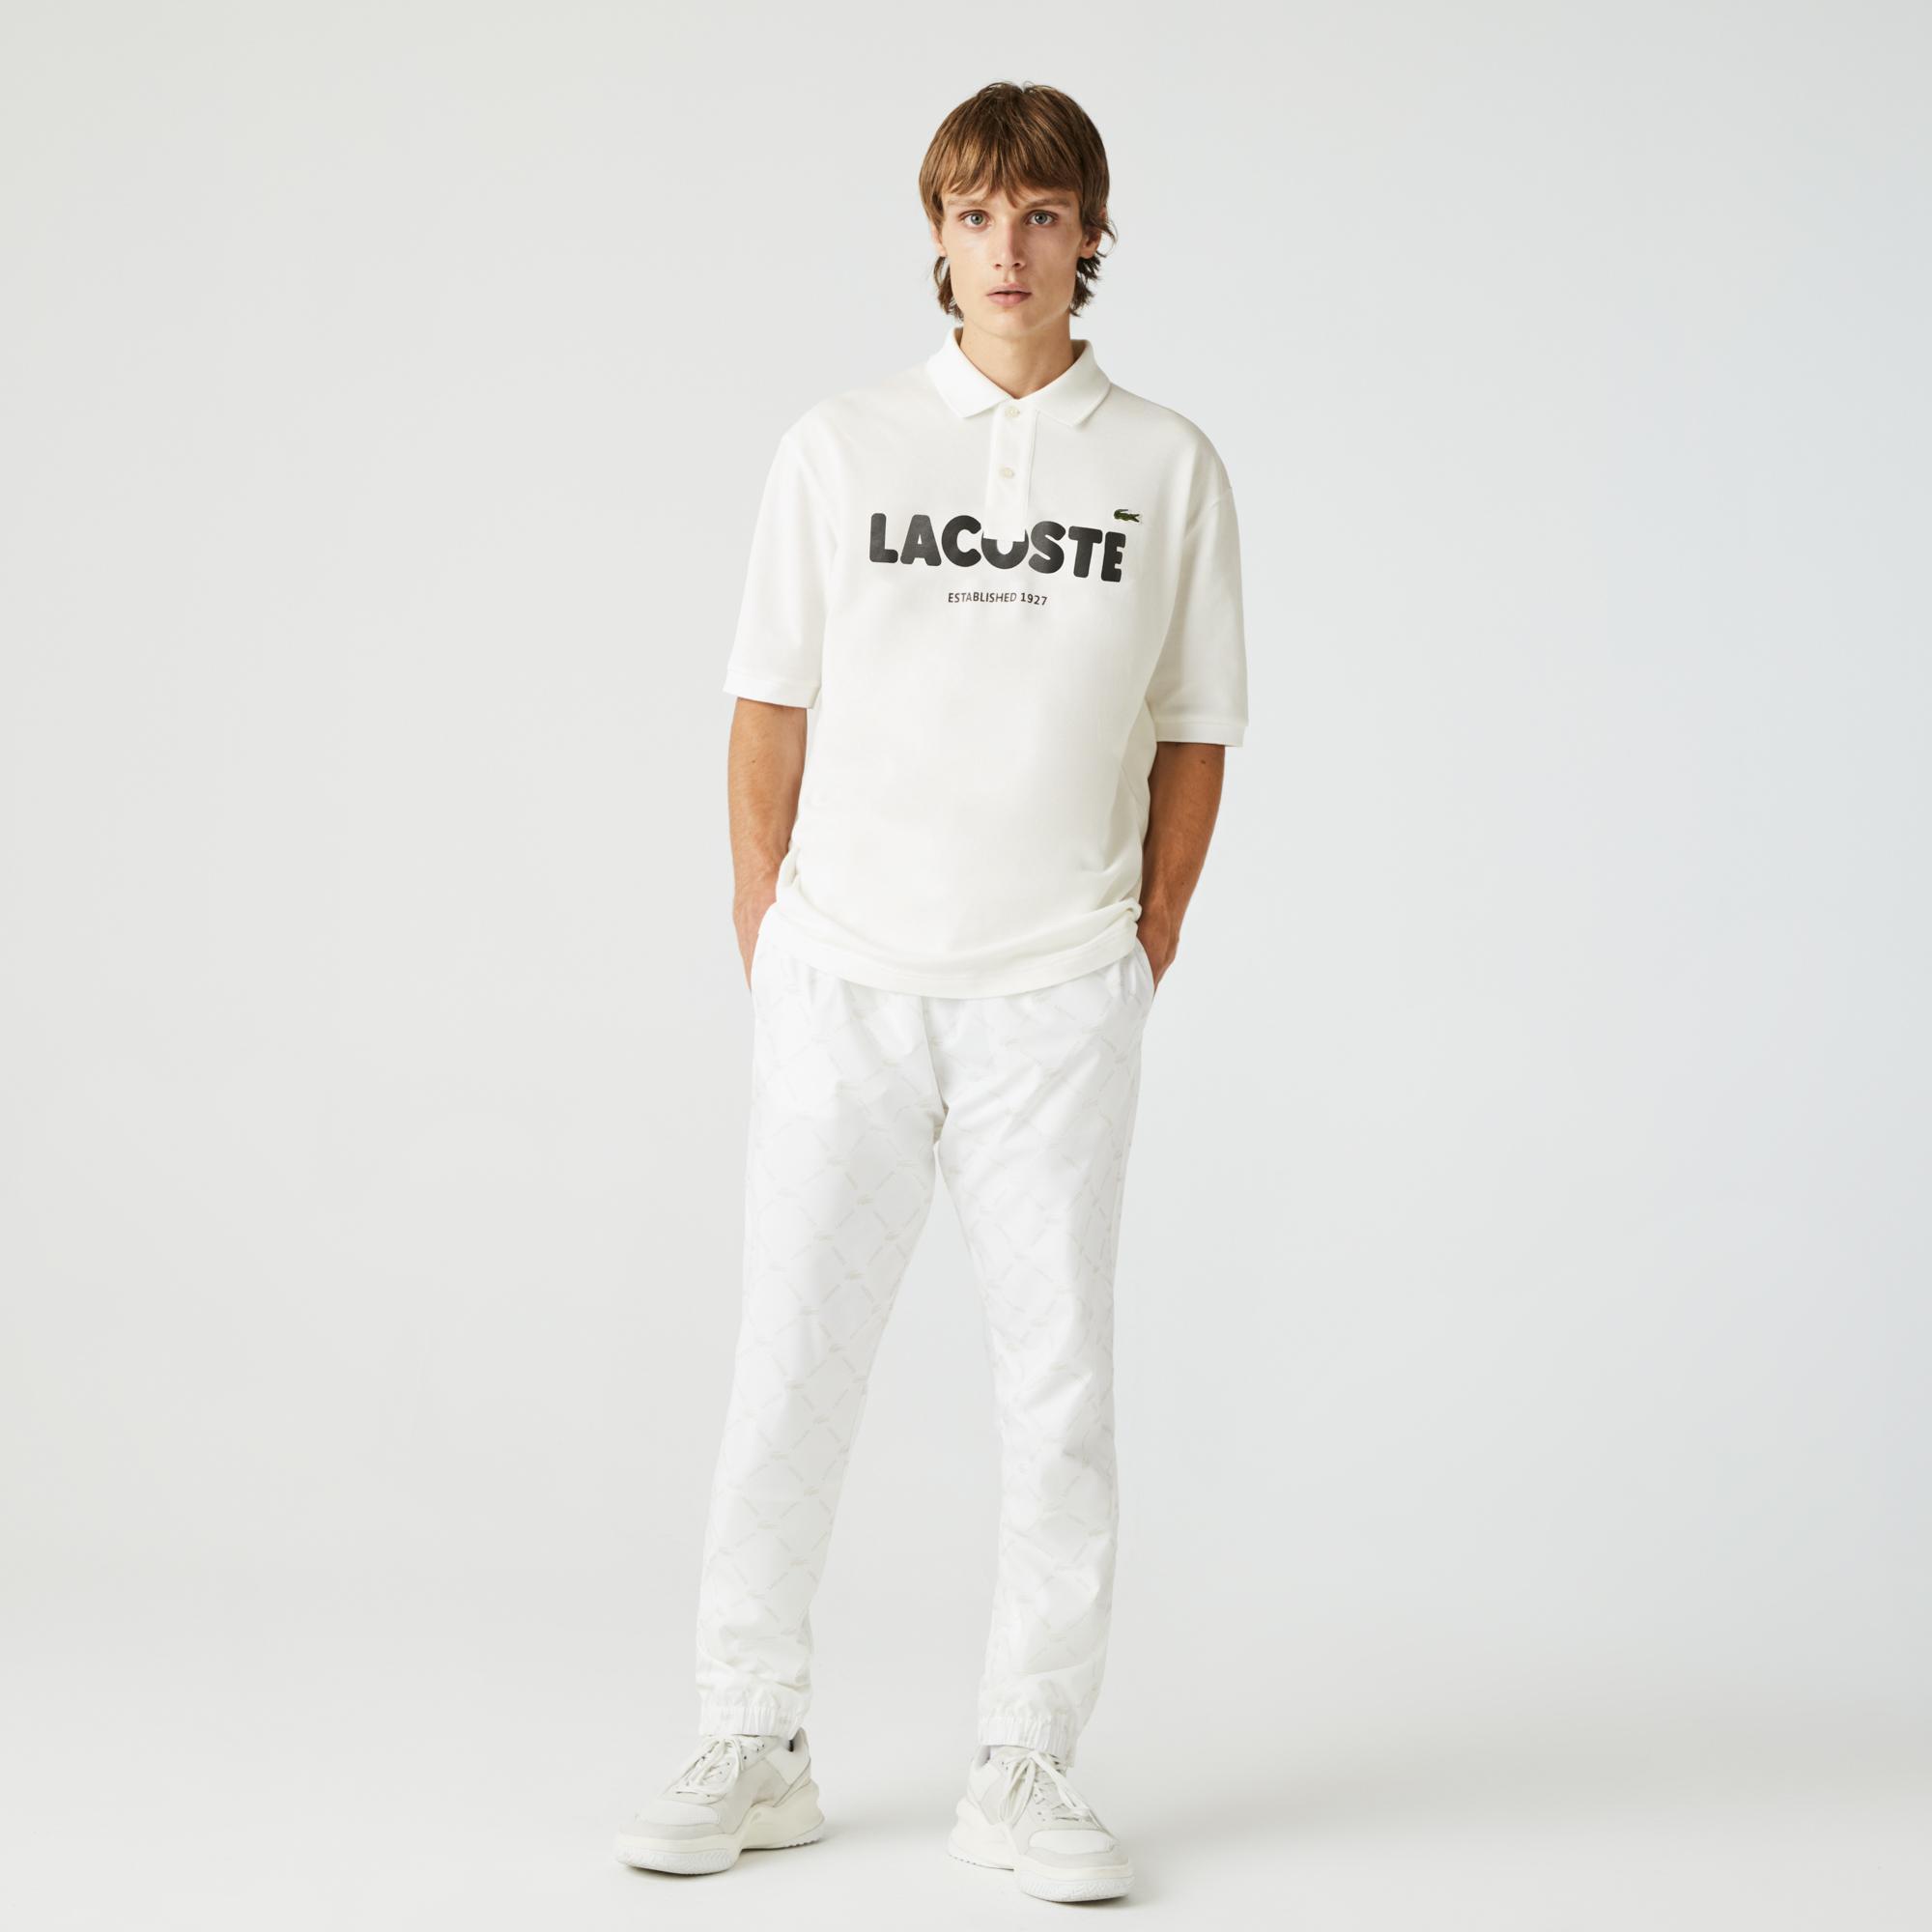 Lacoste L!VE Unisex Loose Fit Baskılı Beyaz Polo